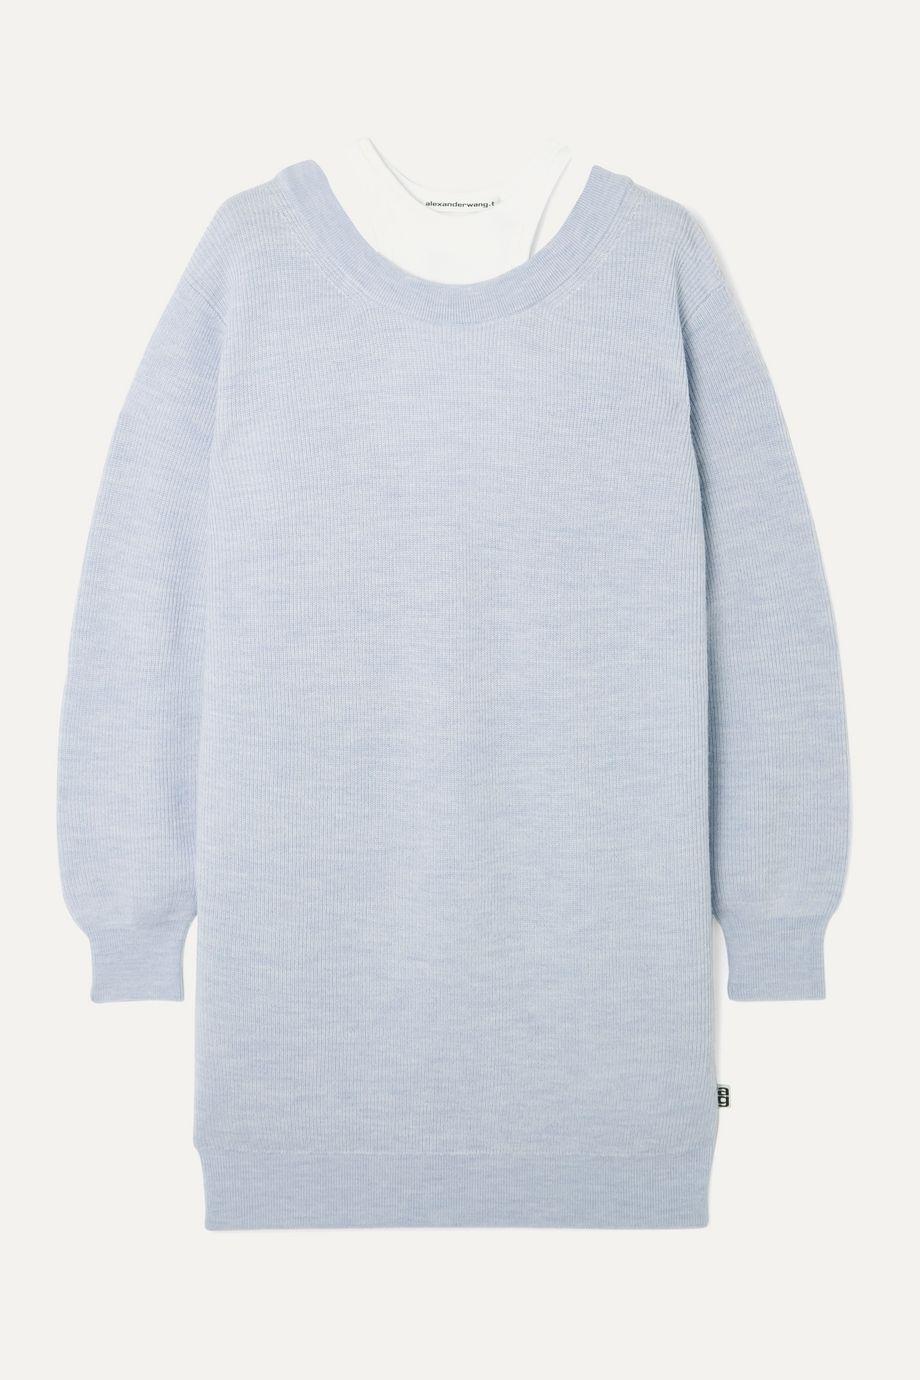 alexanderwang.t Layered merino wool and stretch-cotton jersey mini dress